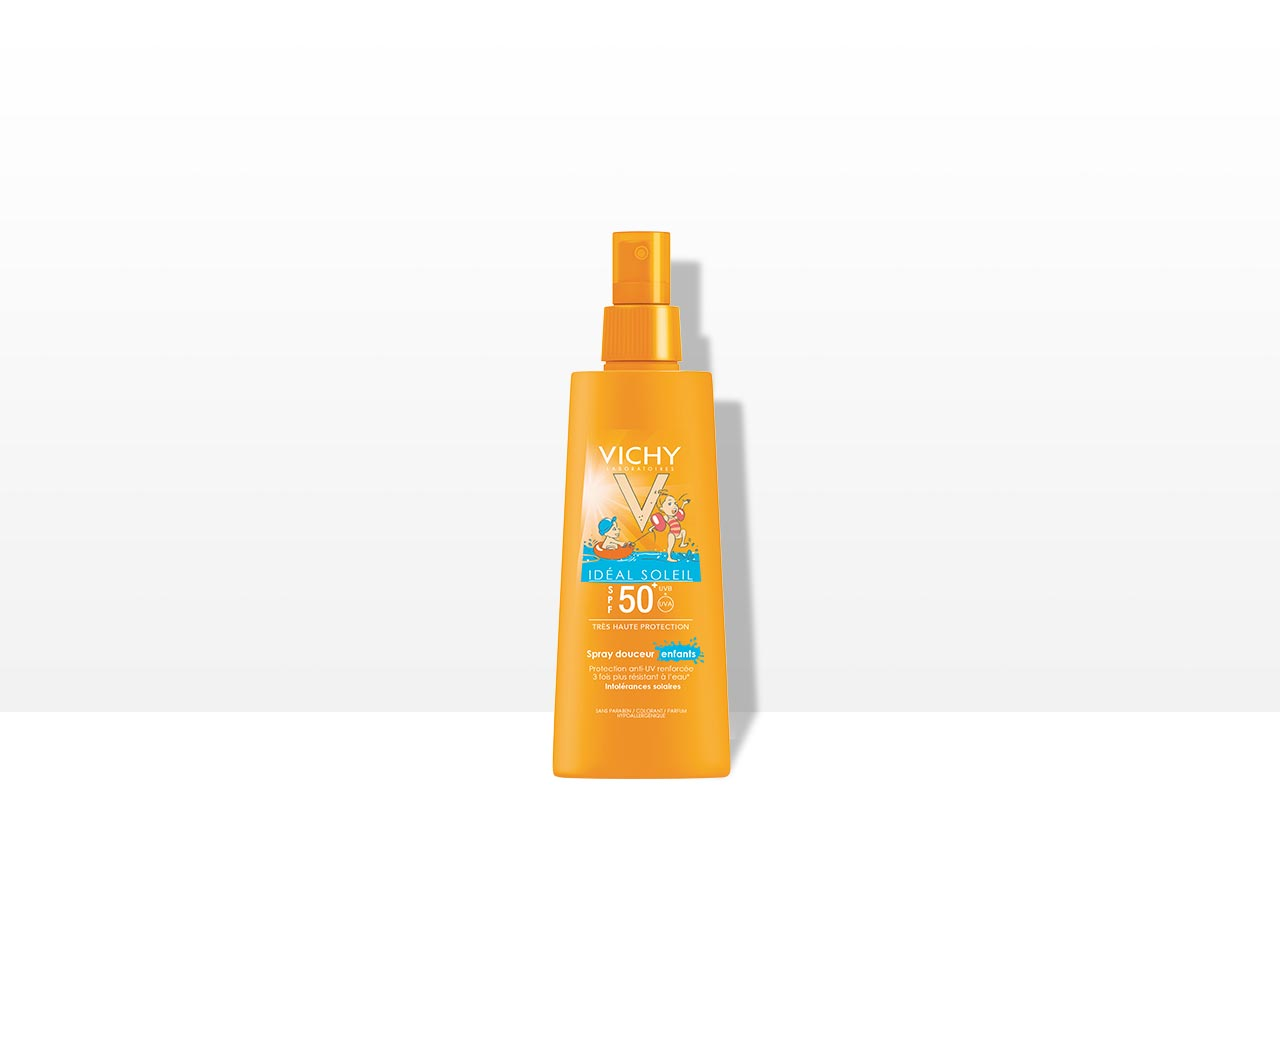 Ideal Soleil - Spray Douceur Enfants SPF 50+ - Vichy